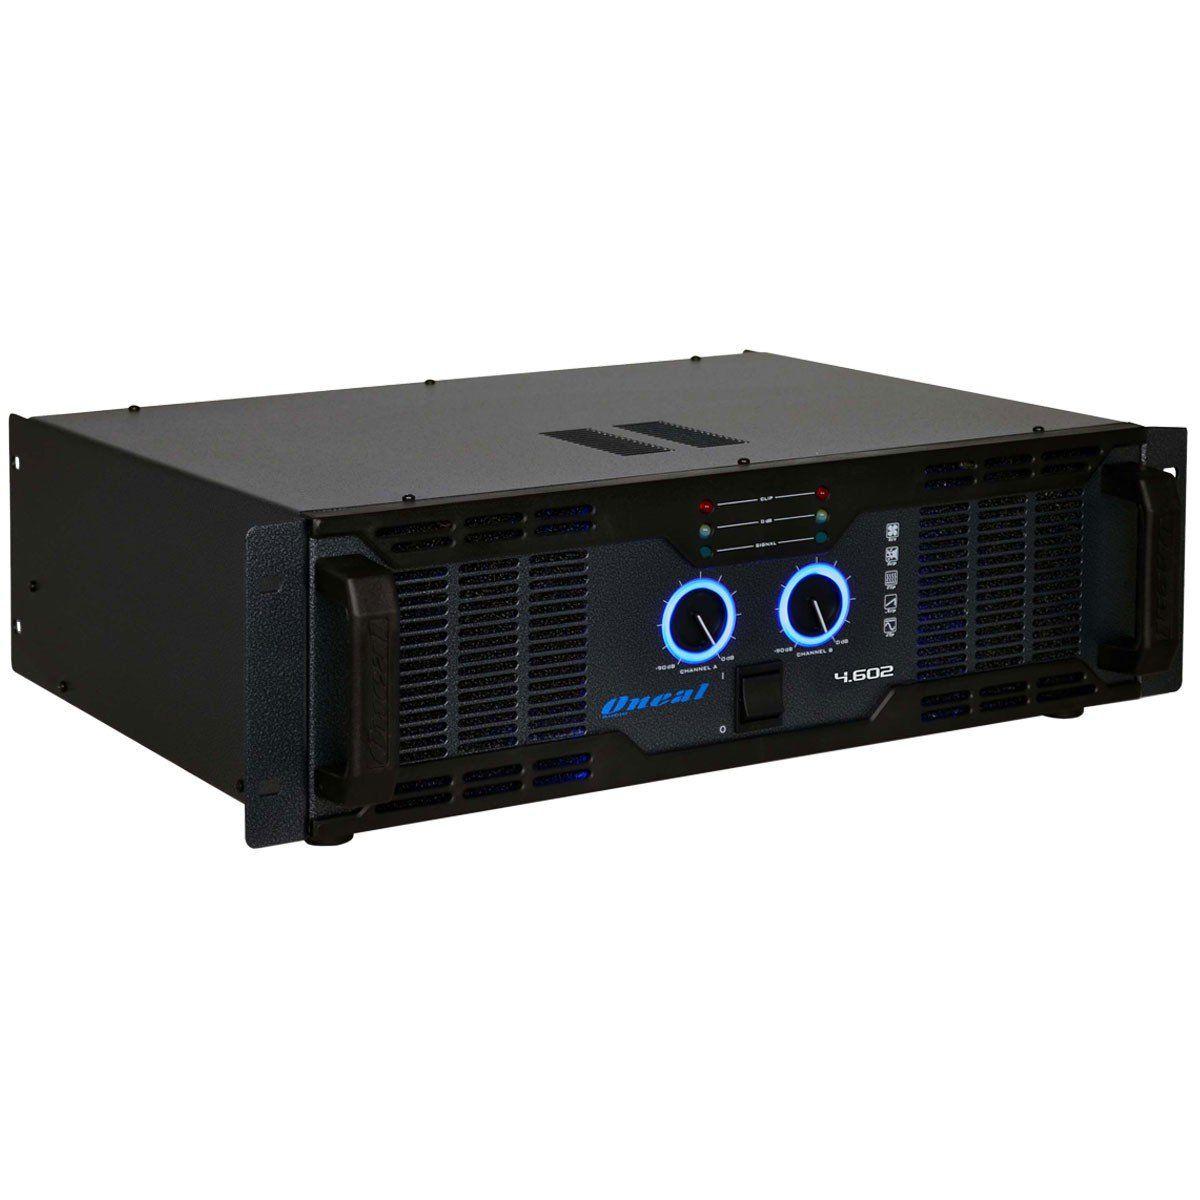 Amplificador de Potência 1300W 4 Ohms  - OLP 4 602 Oneal